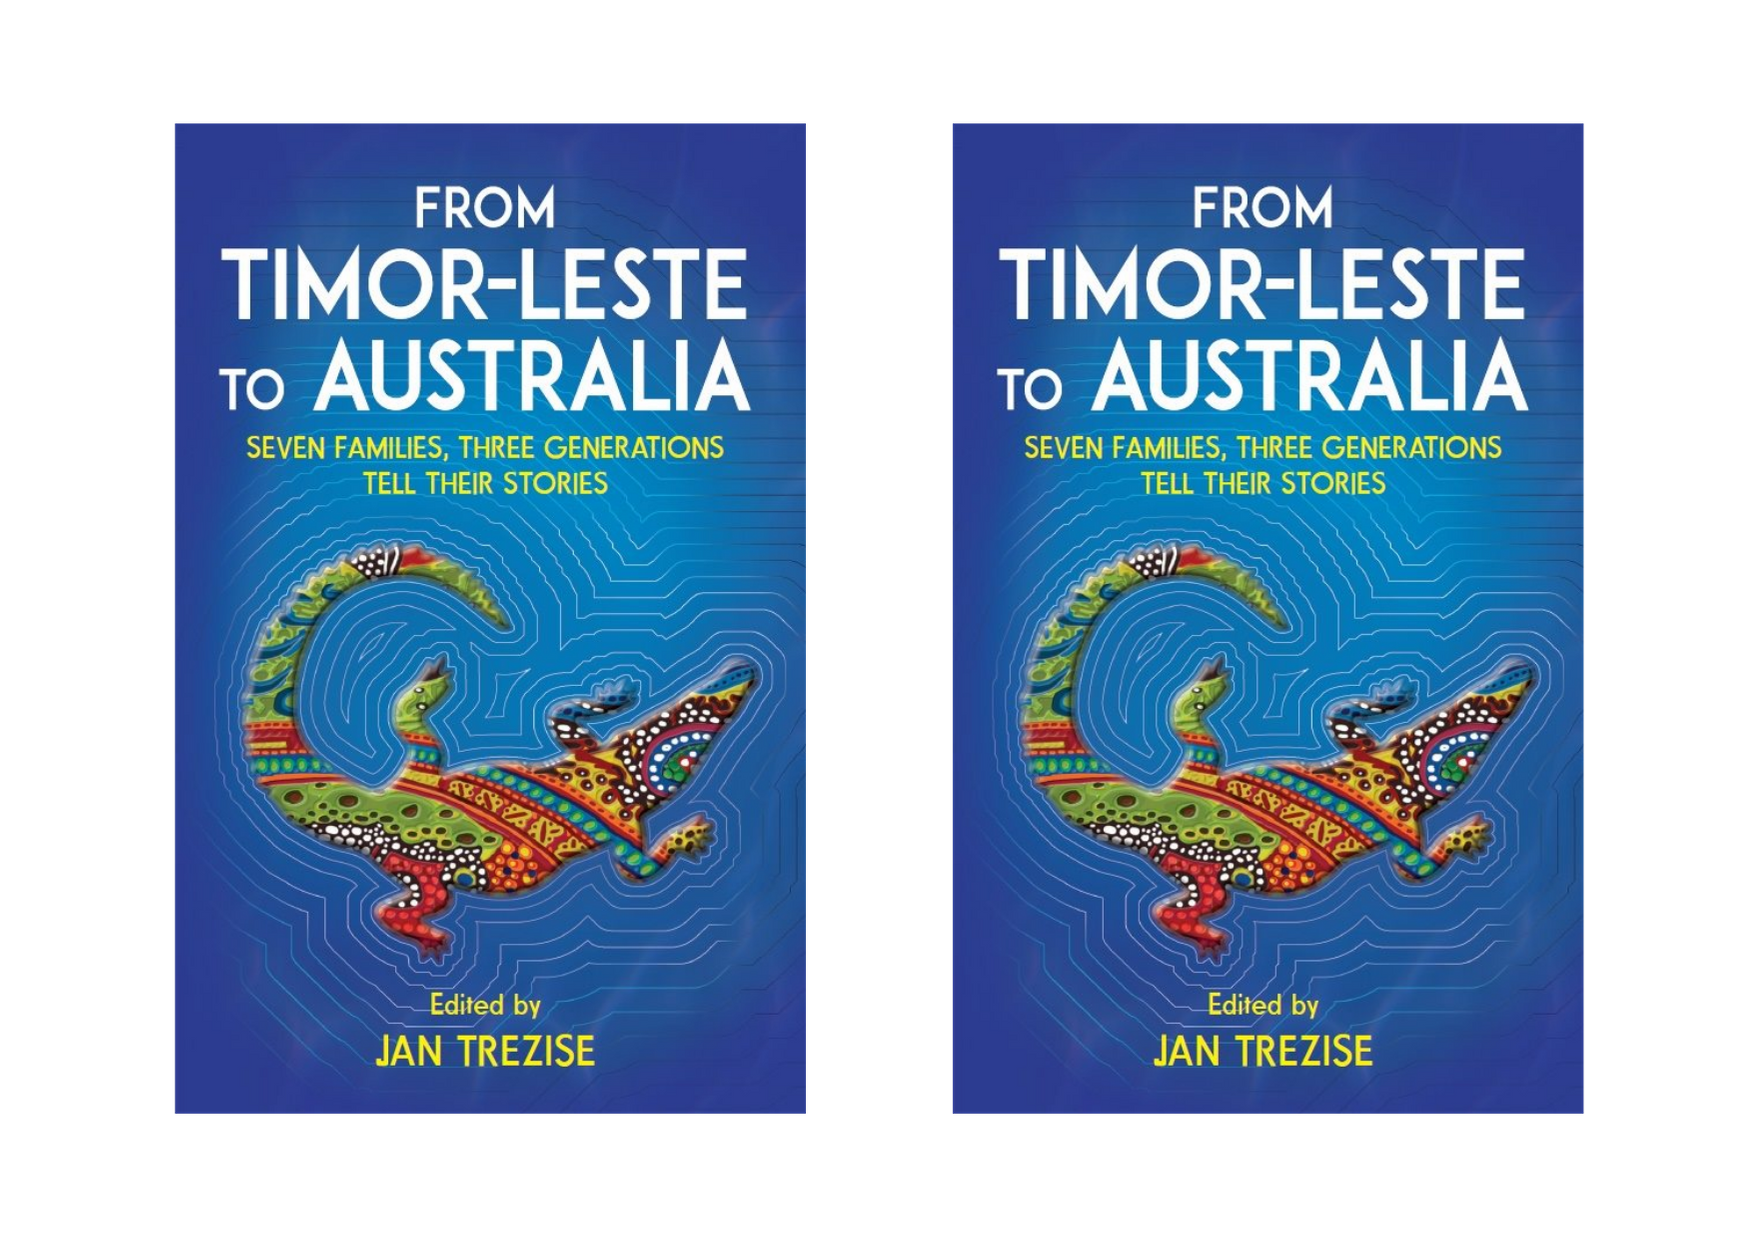 Wild Dog Press - From Timor-Leste to Aus